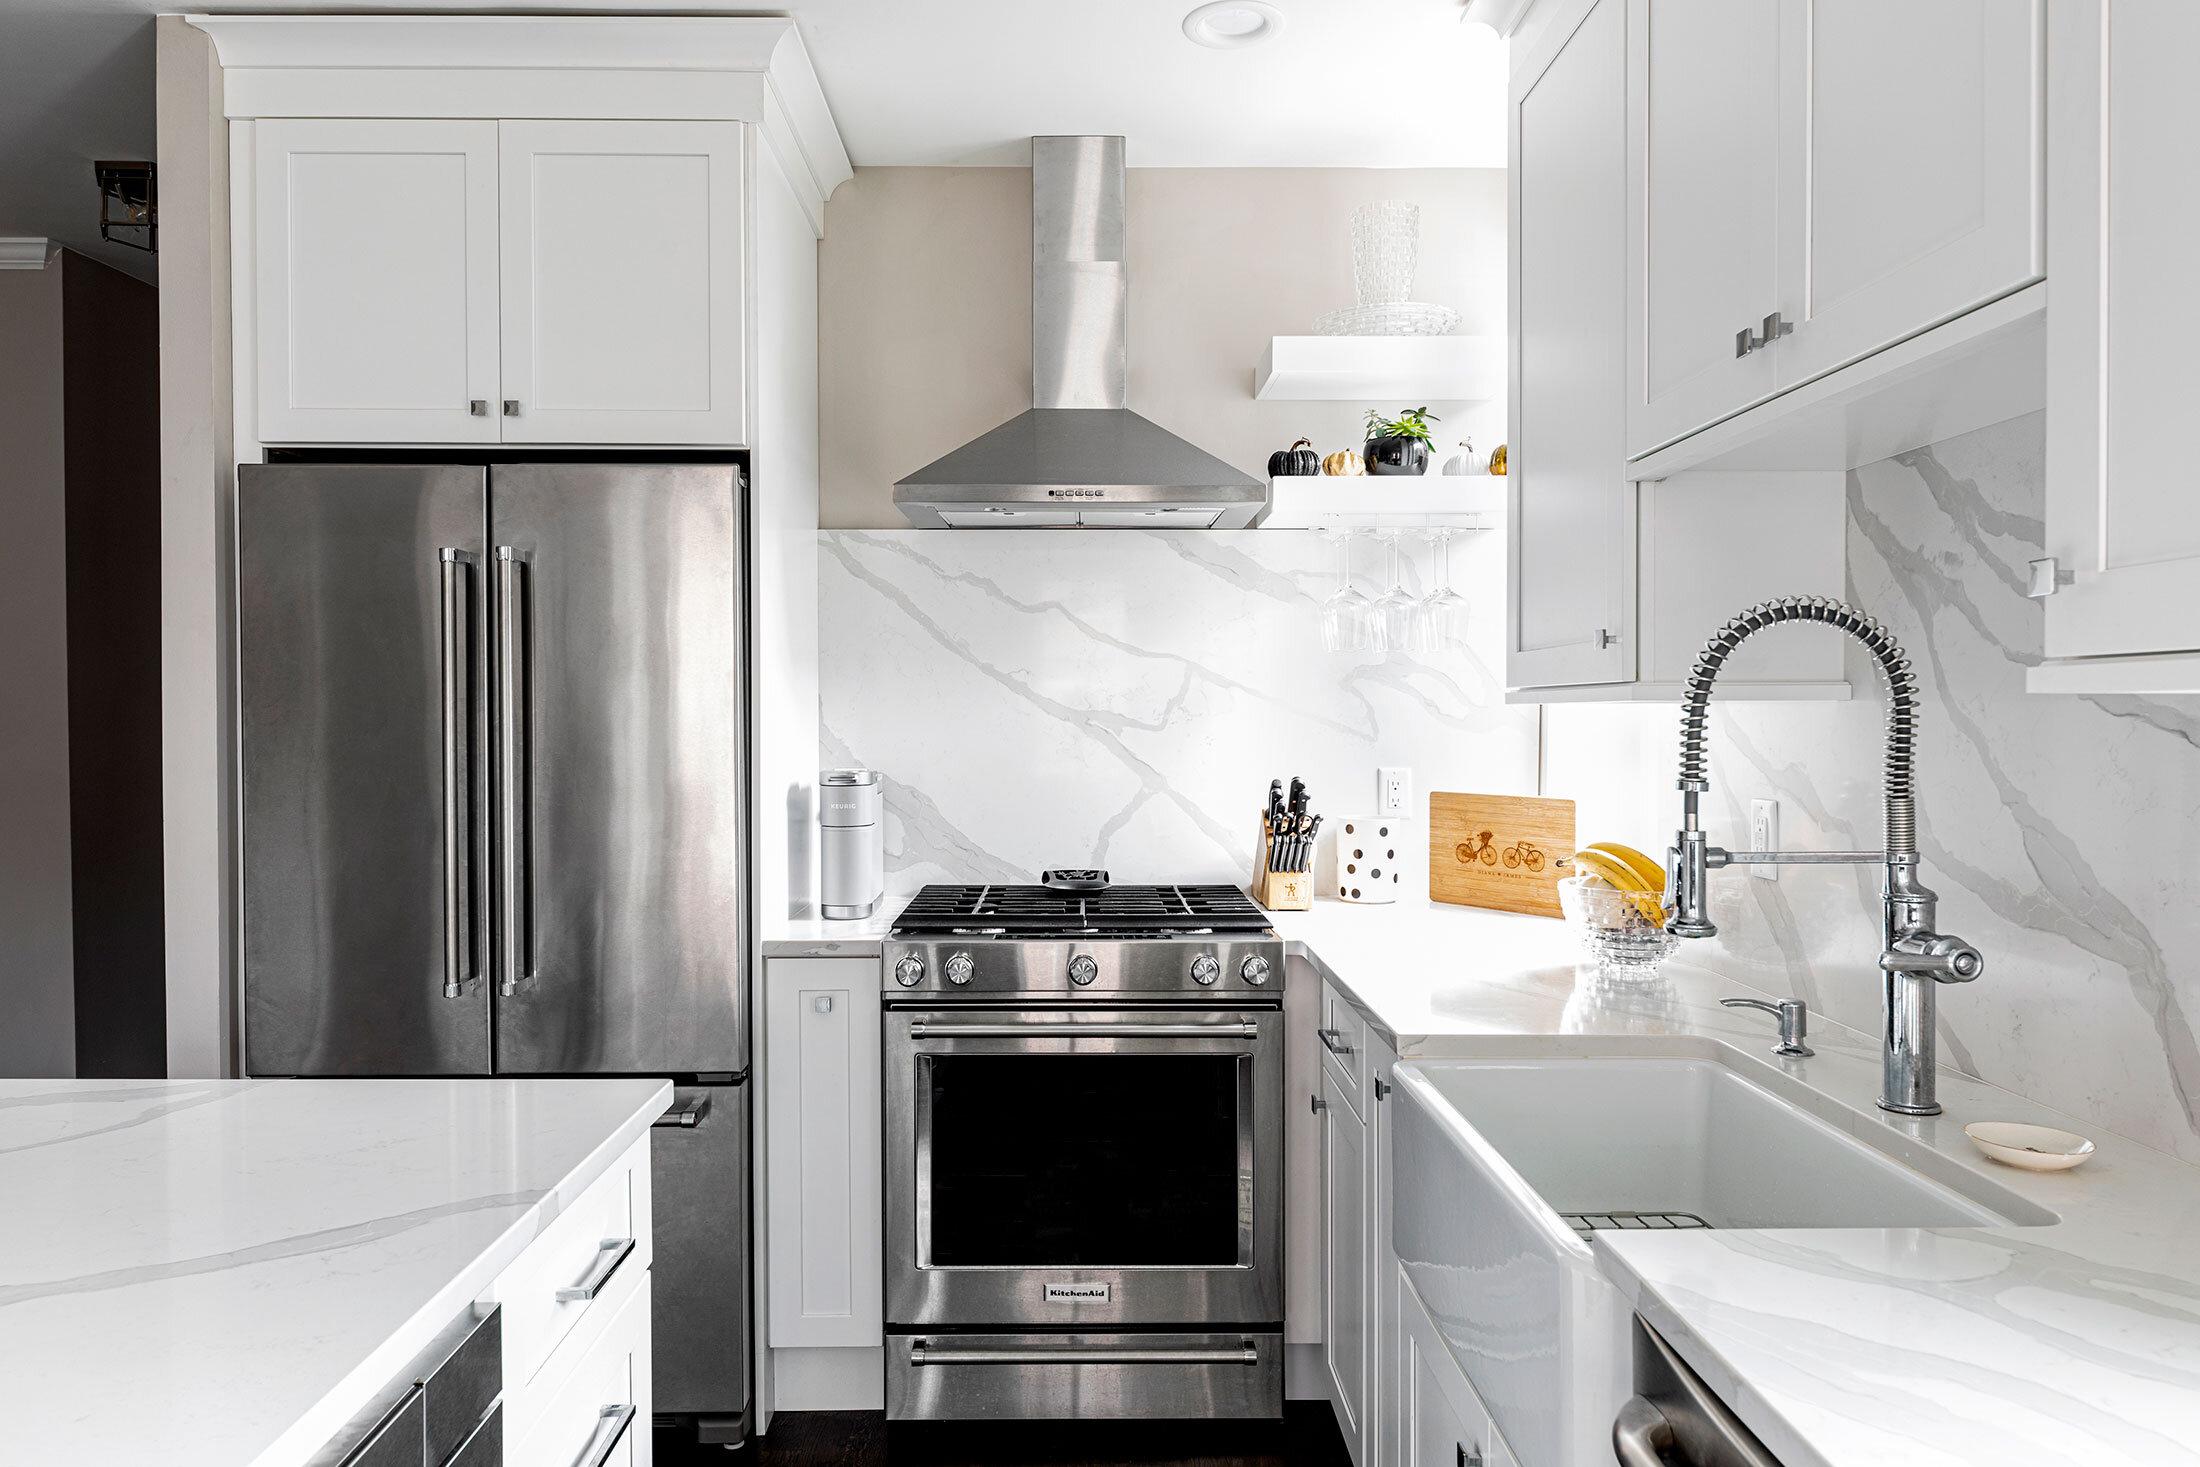 thompson-fine-home-renovations-hoboken-kitchen-marble-stainless-steel-appliances.jpg